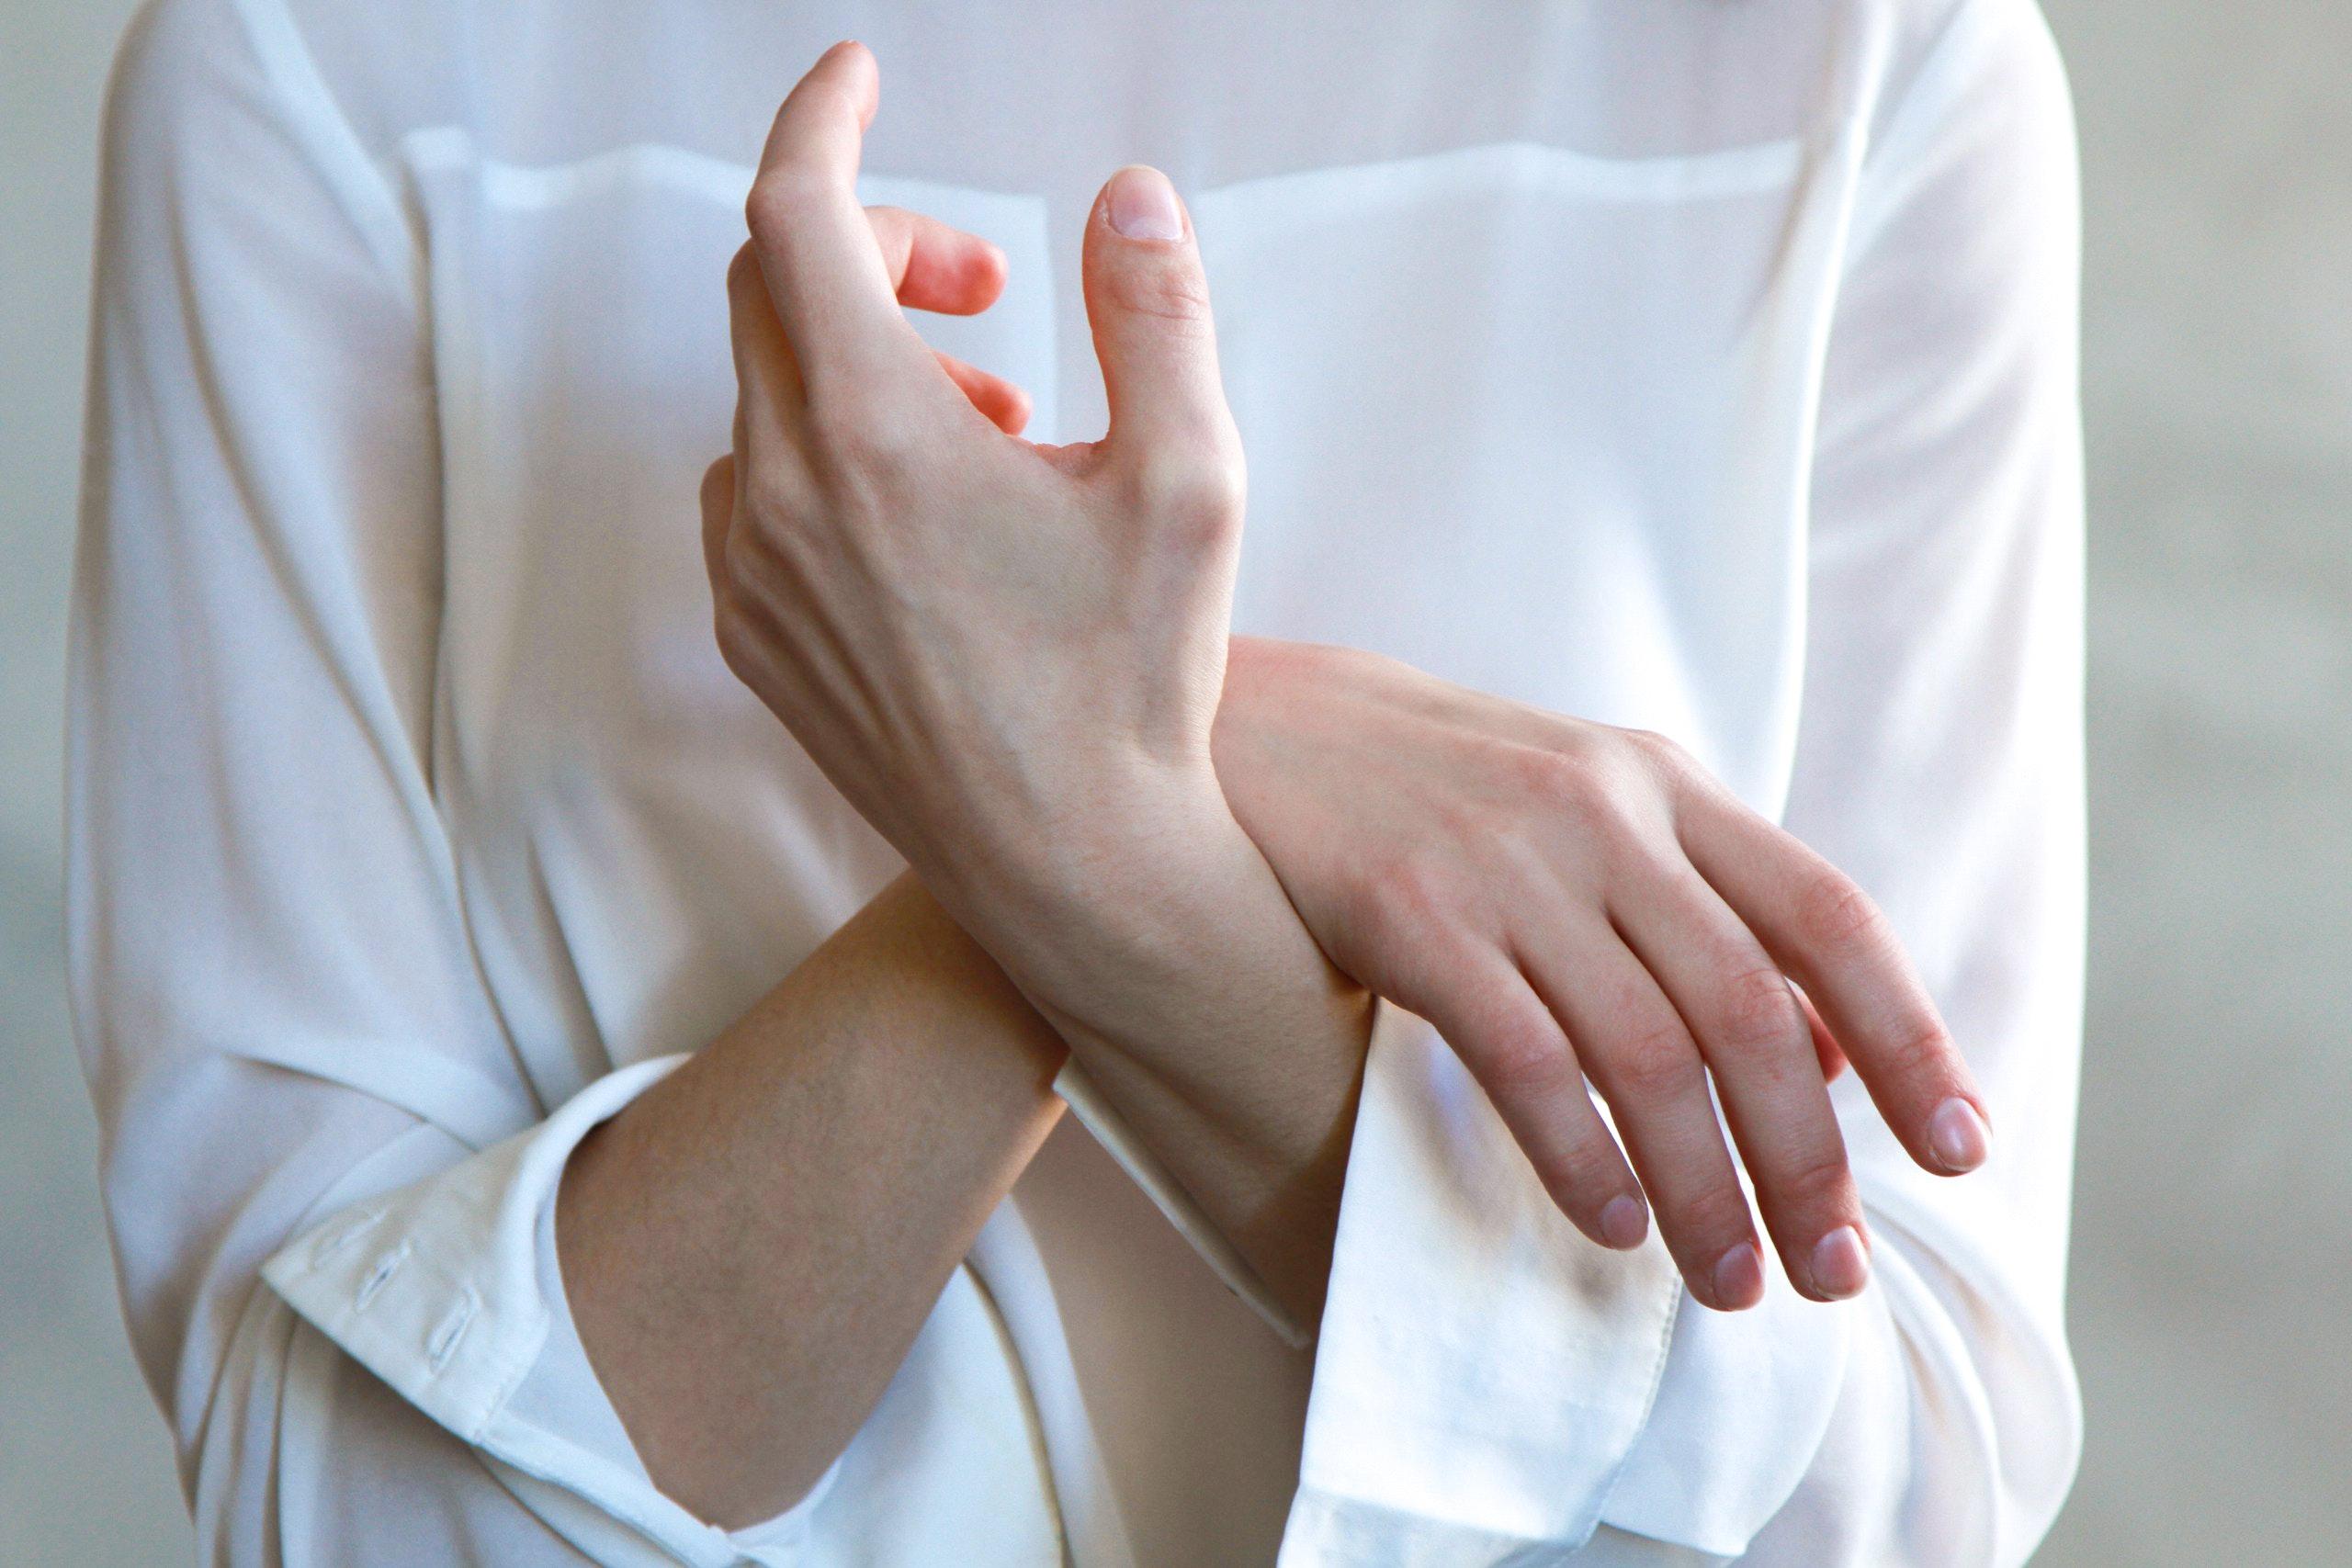 Coronavirus' IMPACT on Mental Health